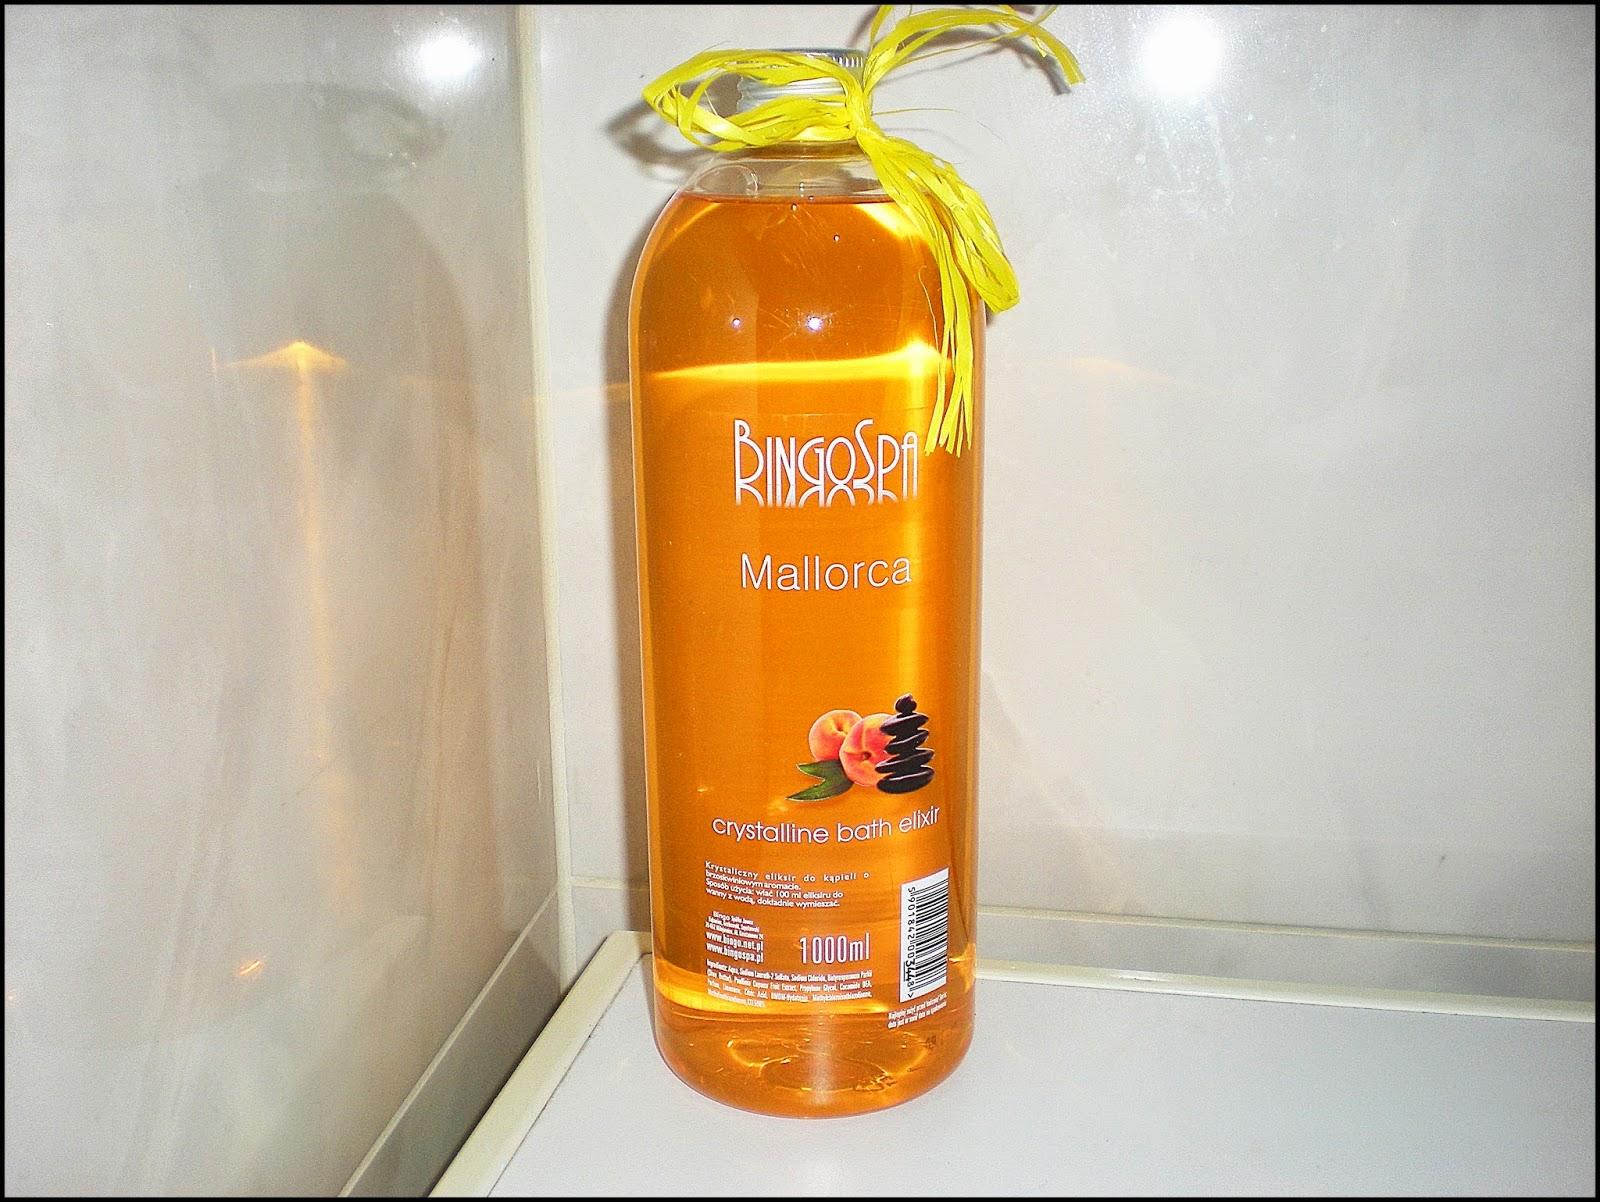 Mallorca Crystalline bath elixir BingoSpa